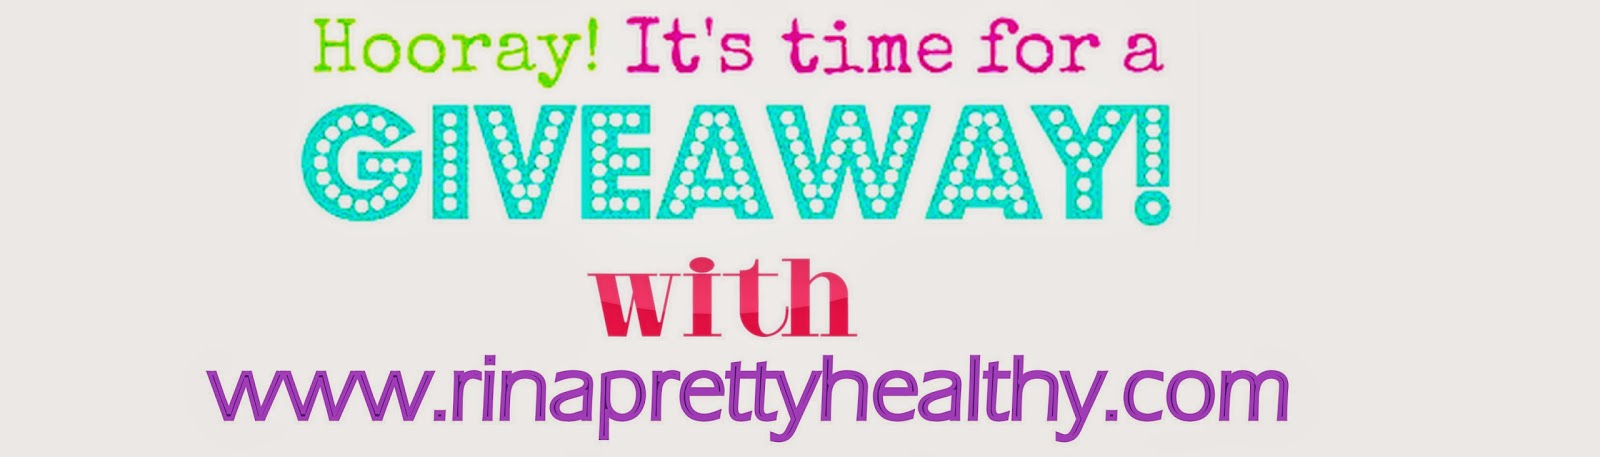 http://www.rinaprettyhealthy.com/2015/02/giveaway-segment-with-rina-pretty.html